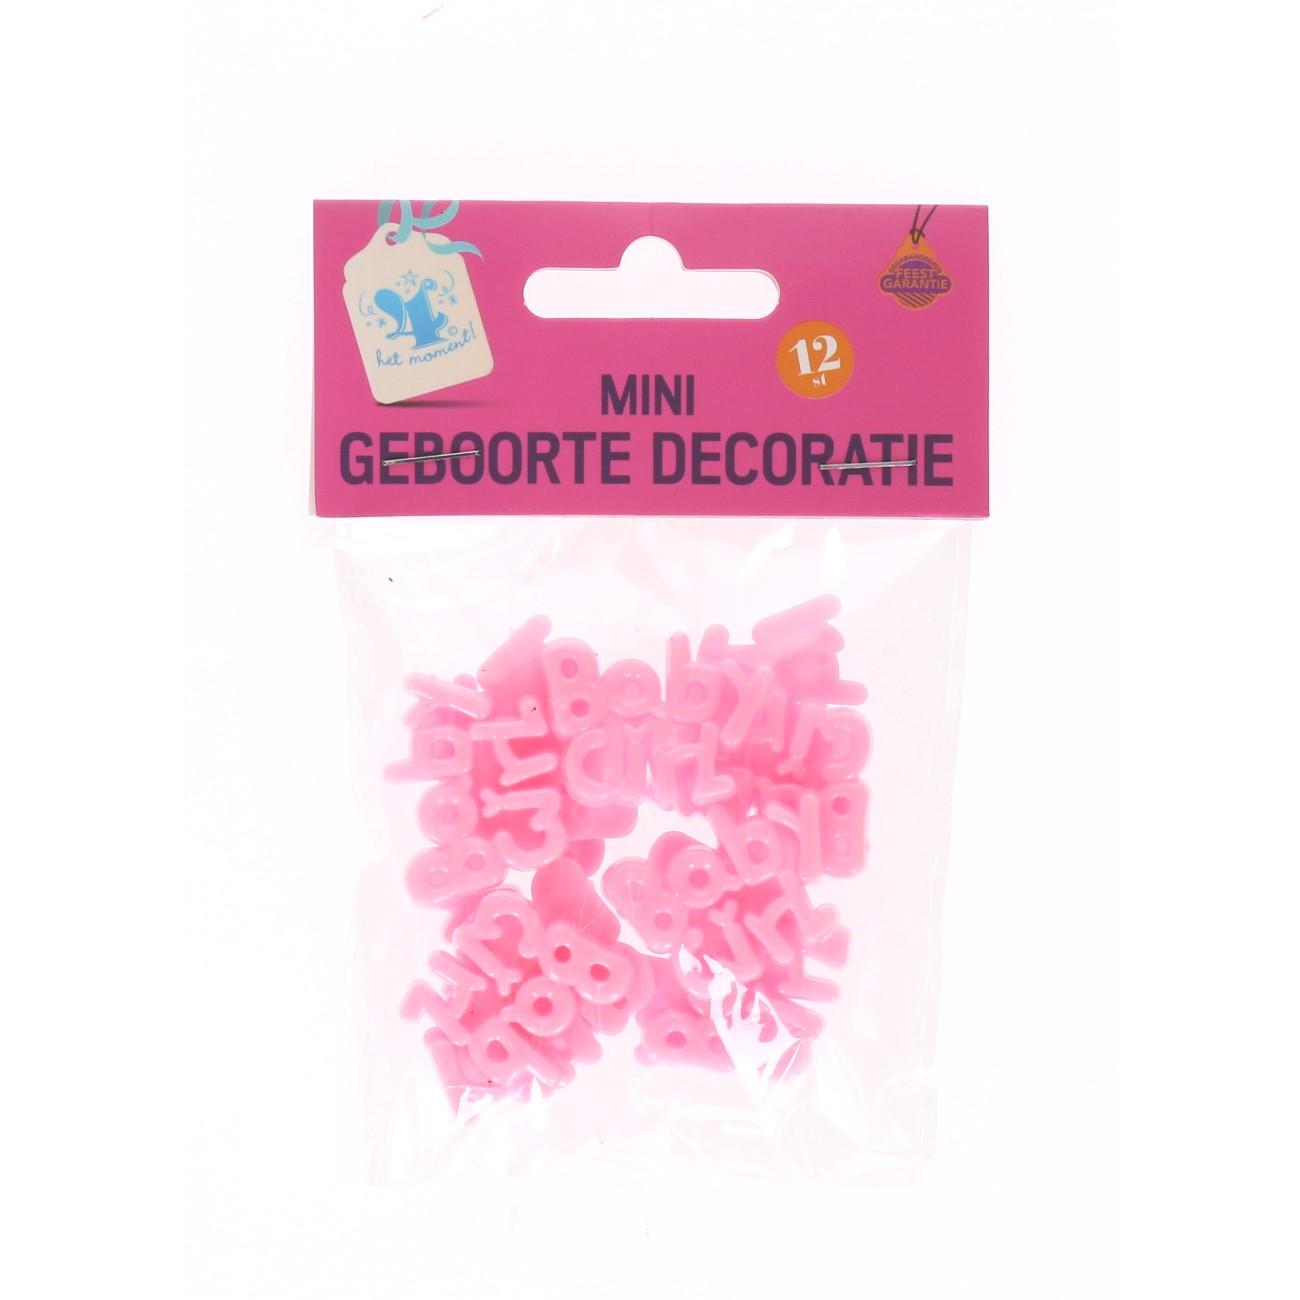 Mini geboorte decoratie roze #658